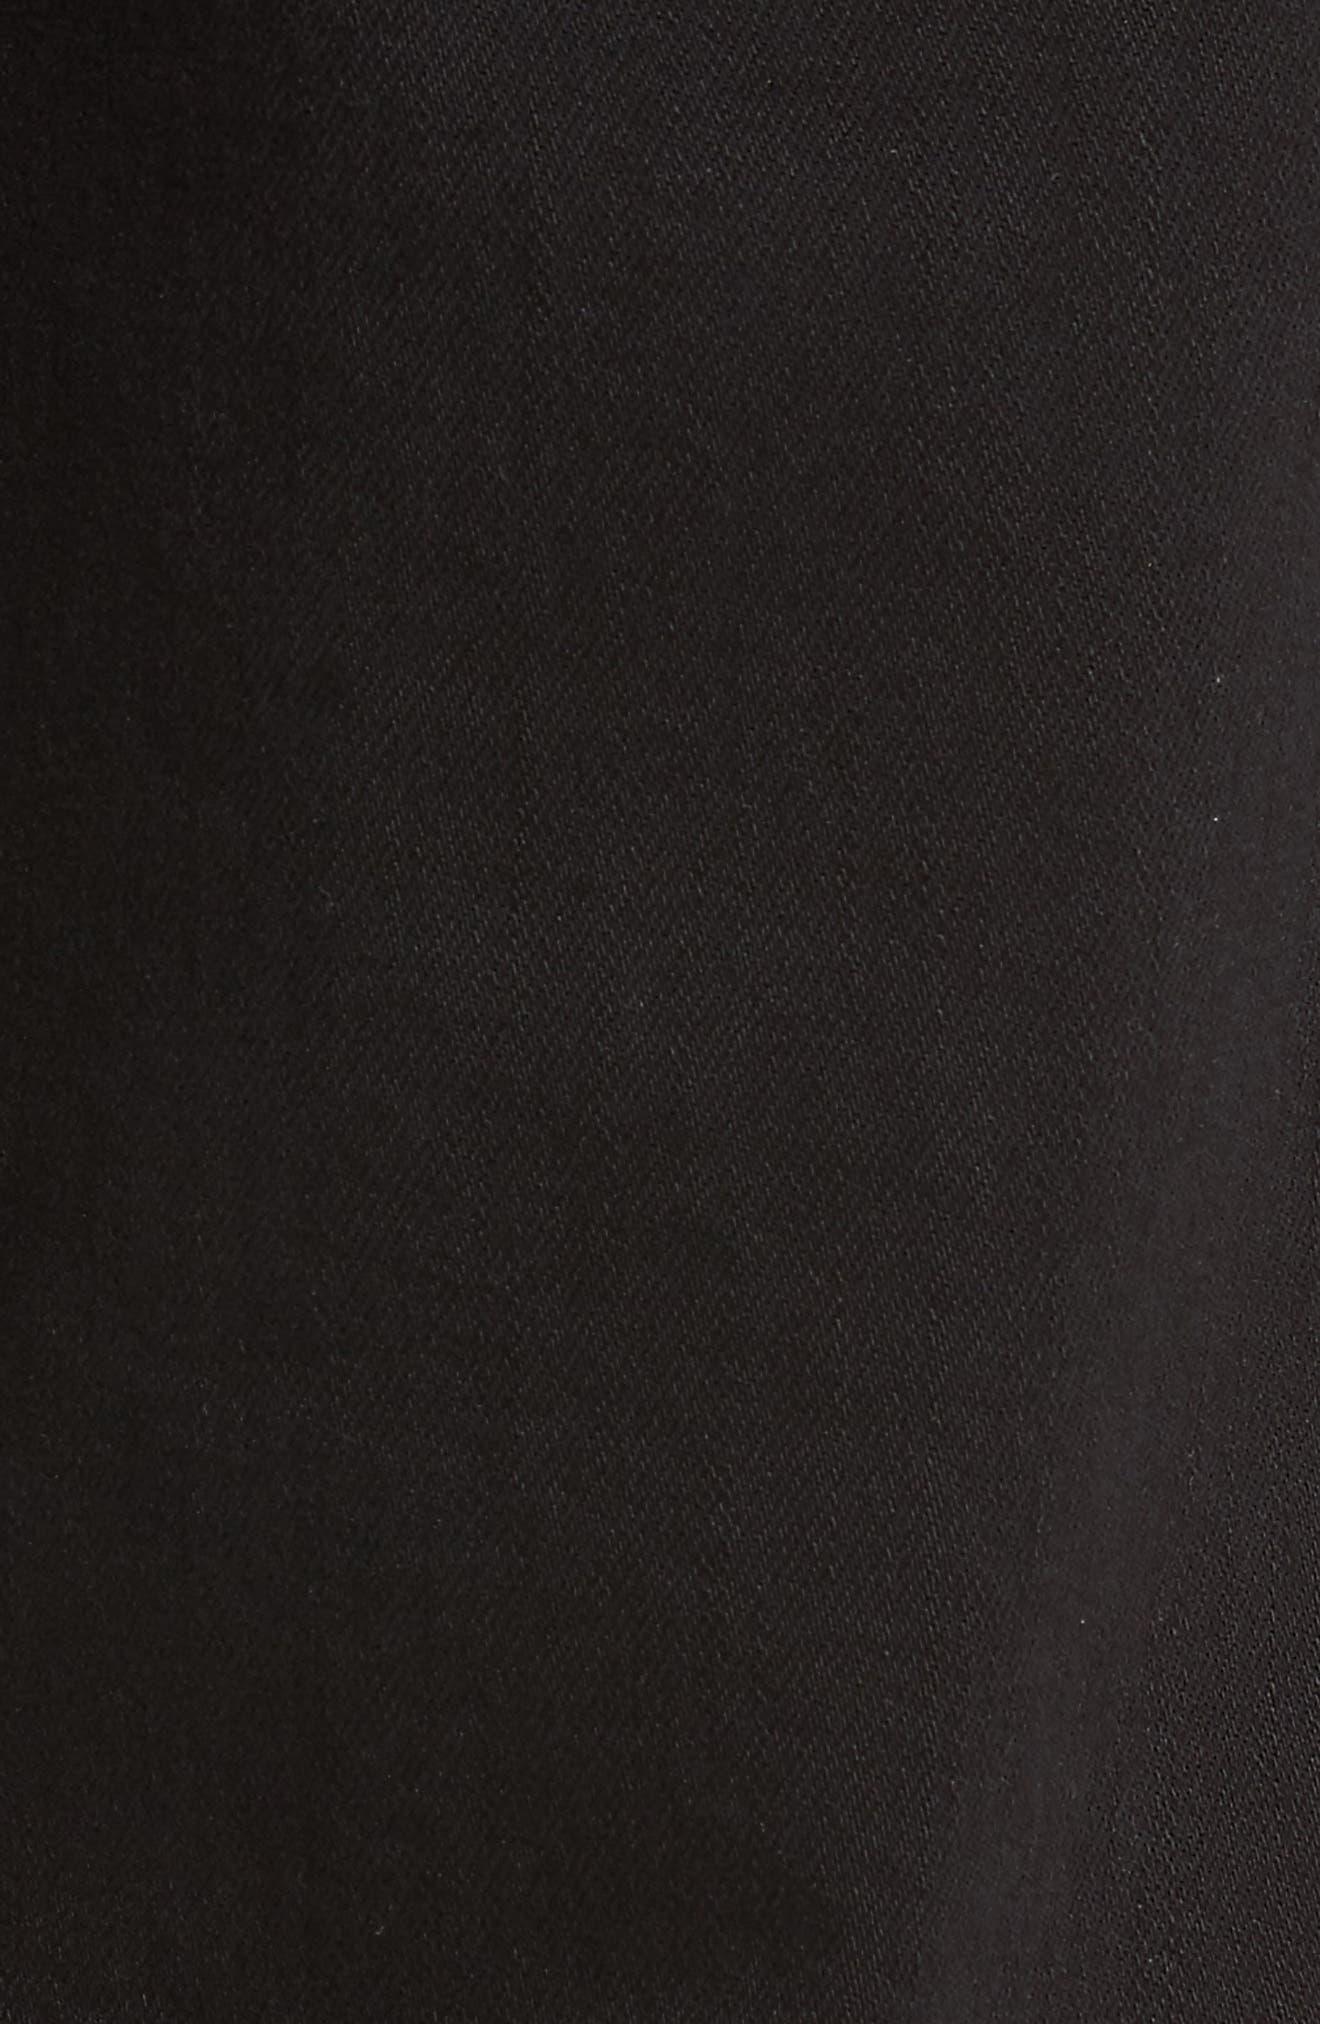 Luxe Performance - Slimmy Slim Fit Jeans,                             Alternate thumbnail 5, color,                             ANNEX BLACK